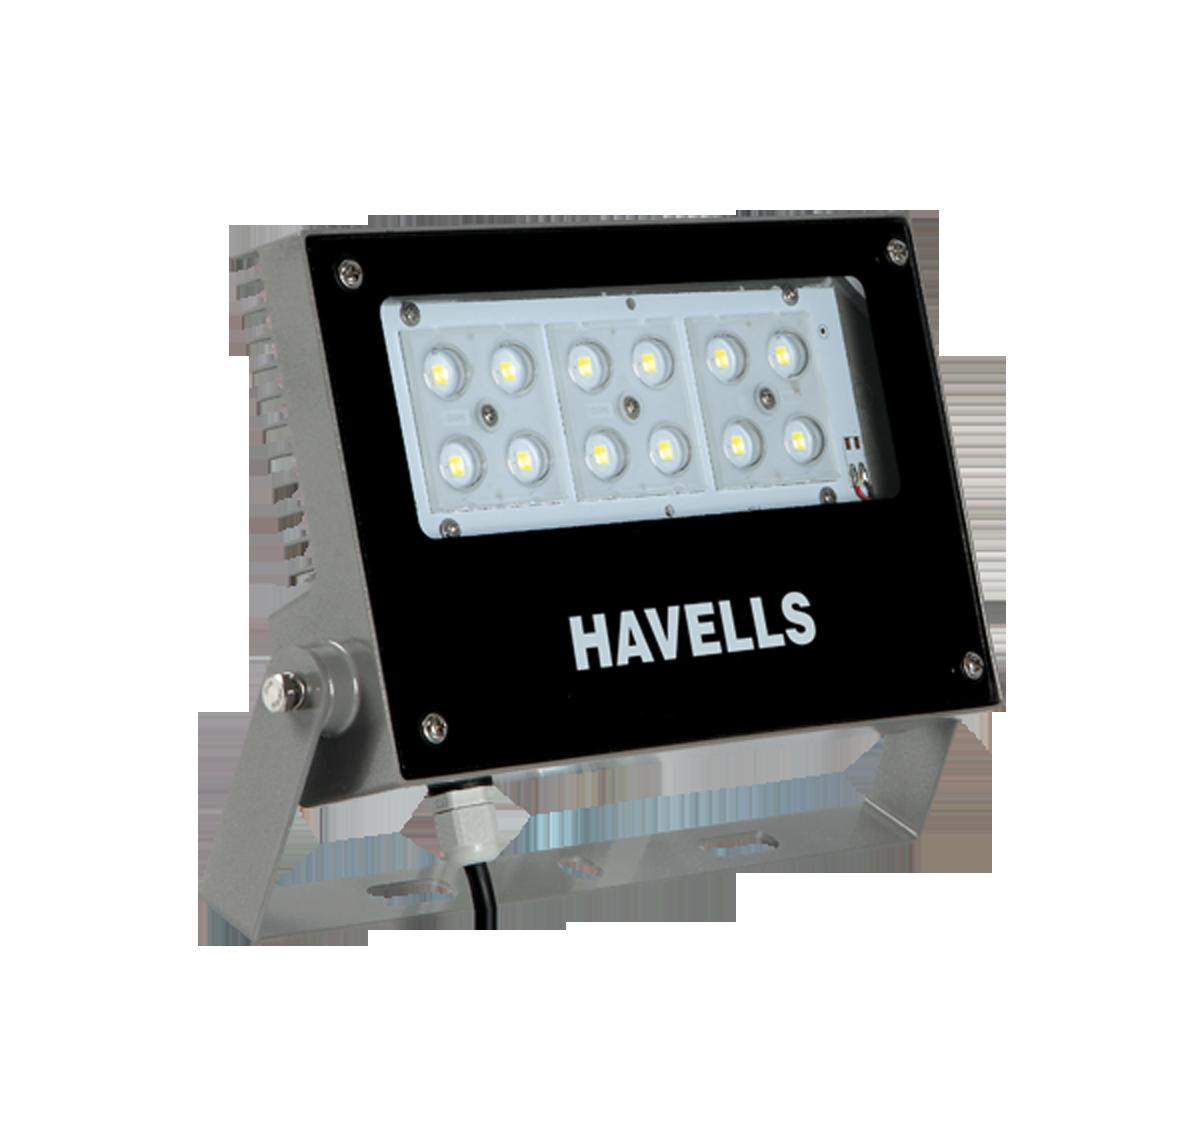 Havells Led Luminaires Flood Lighting Jeta Compacto 60 W L